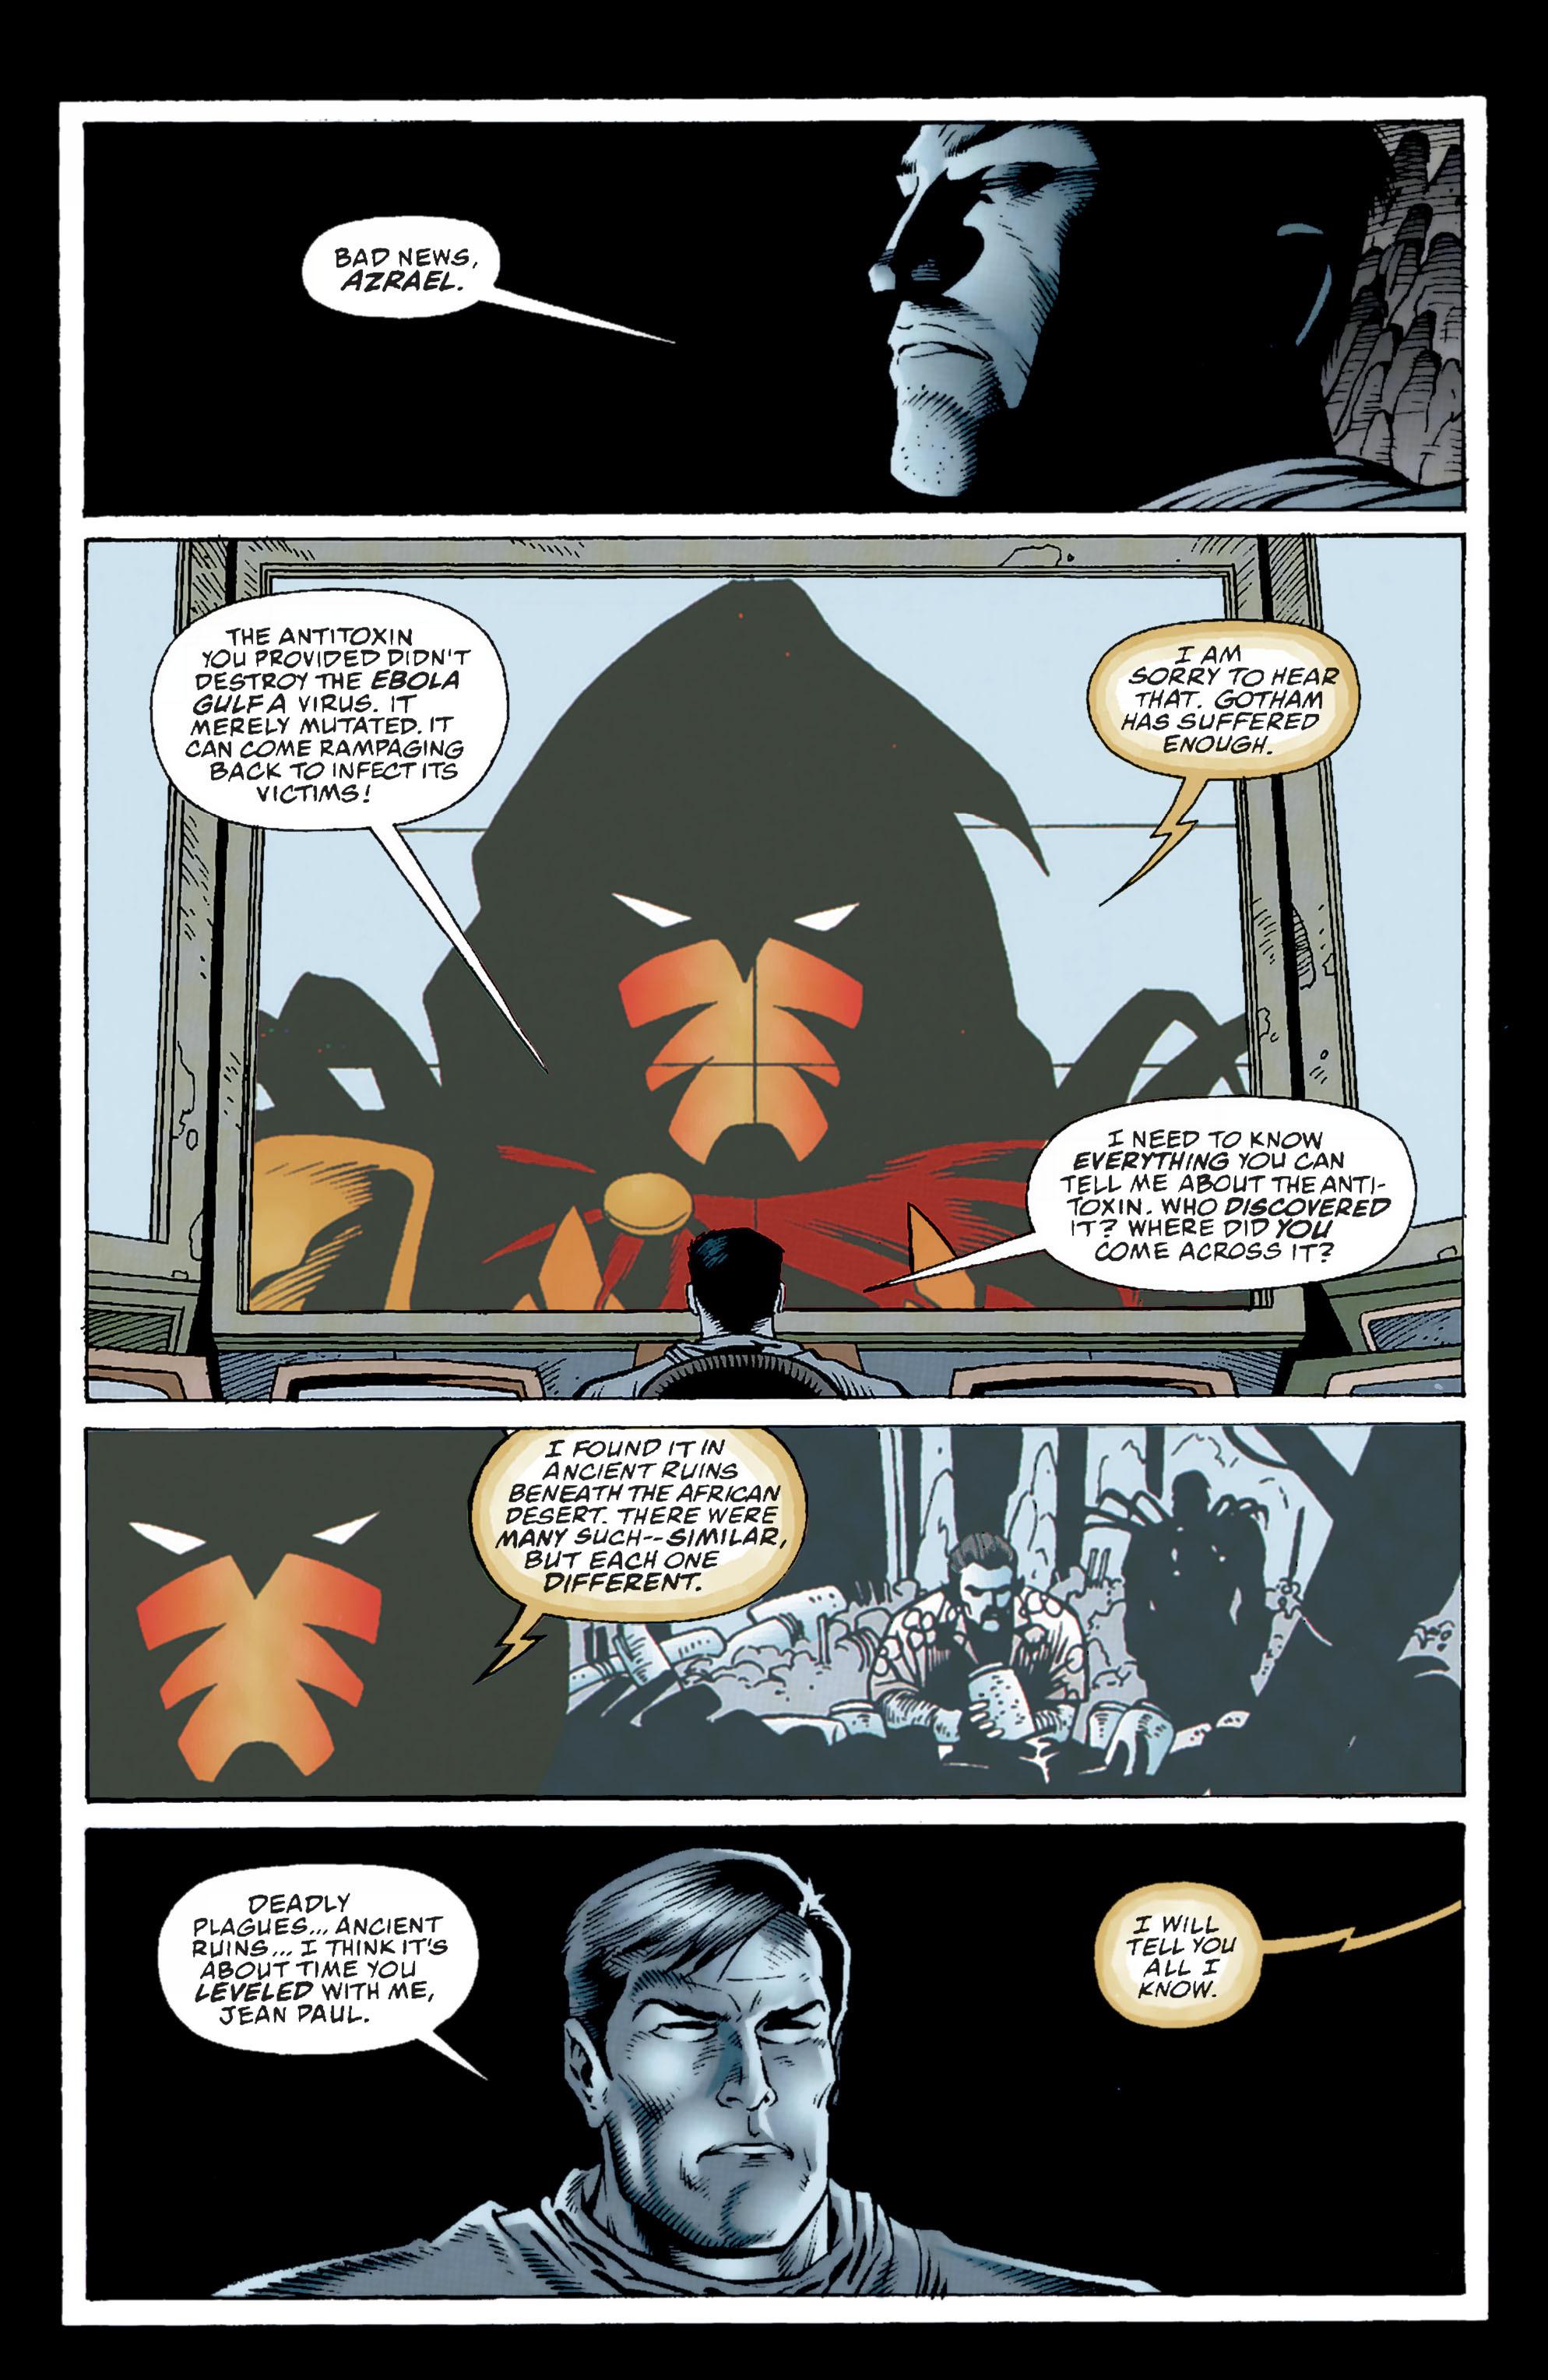 蝙蝠侠:遗产(2017): Chapter 1 - Page 蝙蝠侠:遗产(2017)